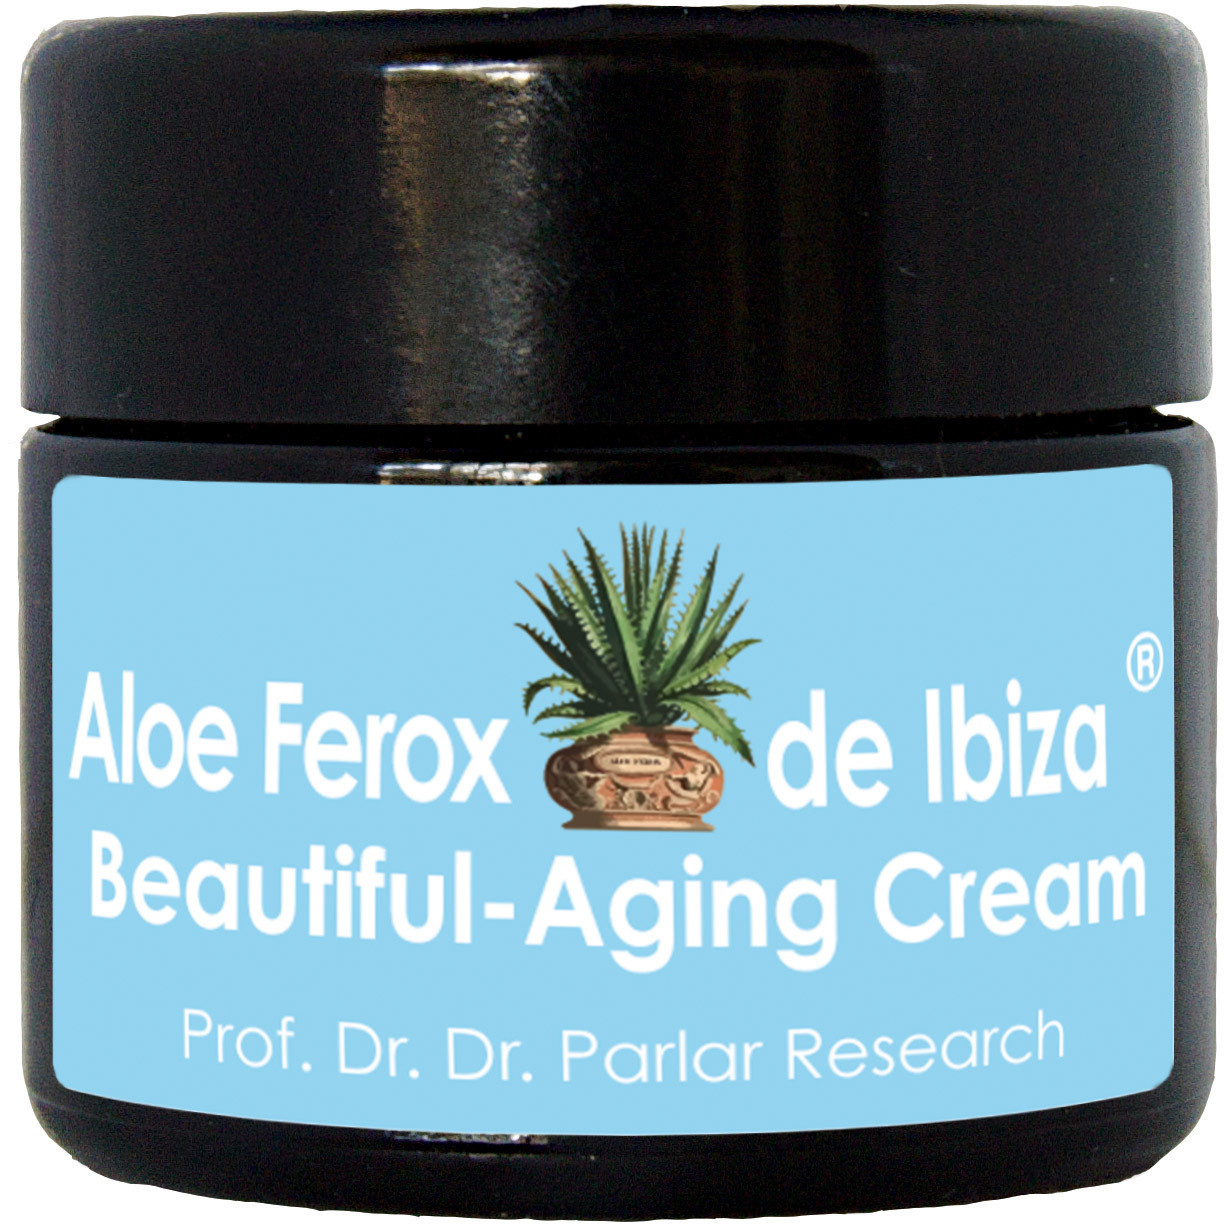 Beautiful-Aging Cream 50 ml